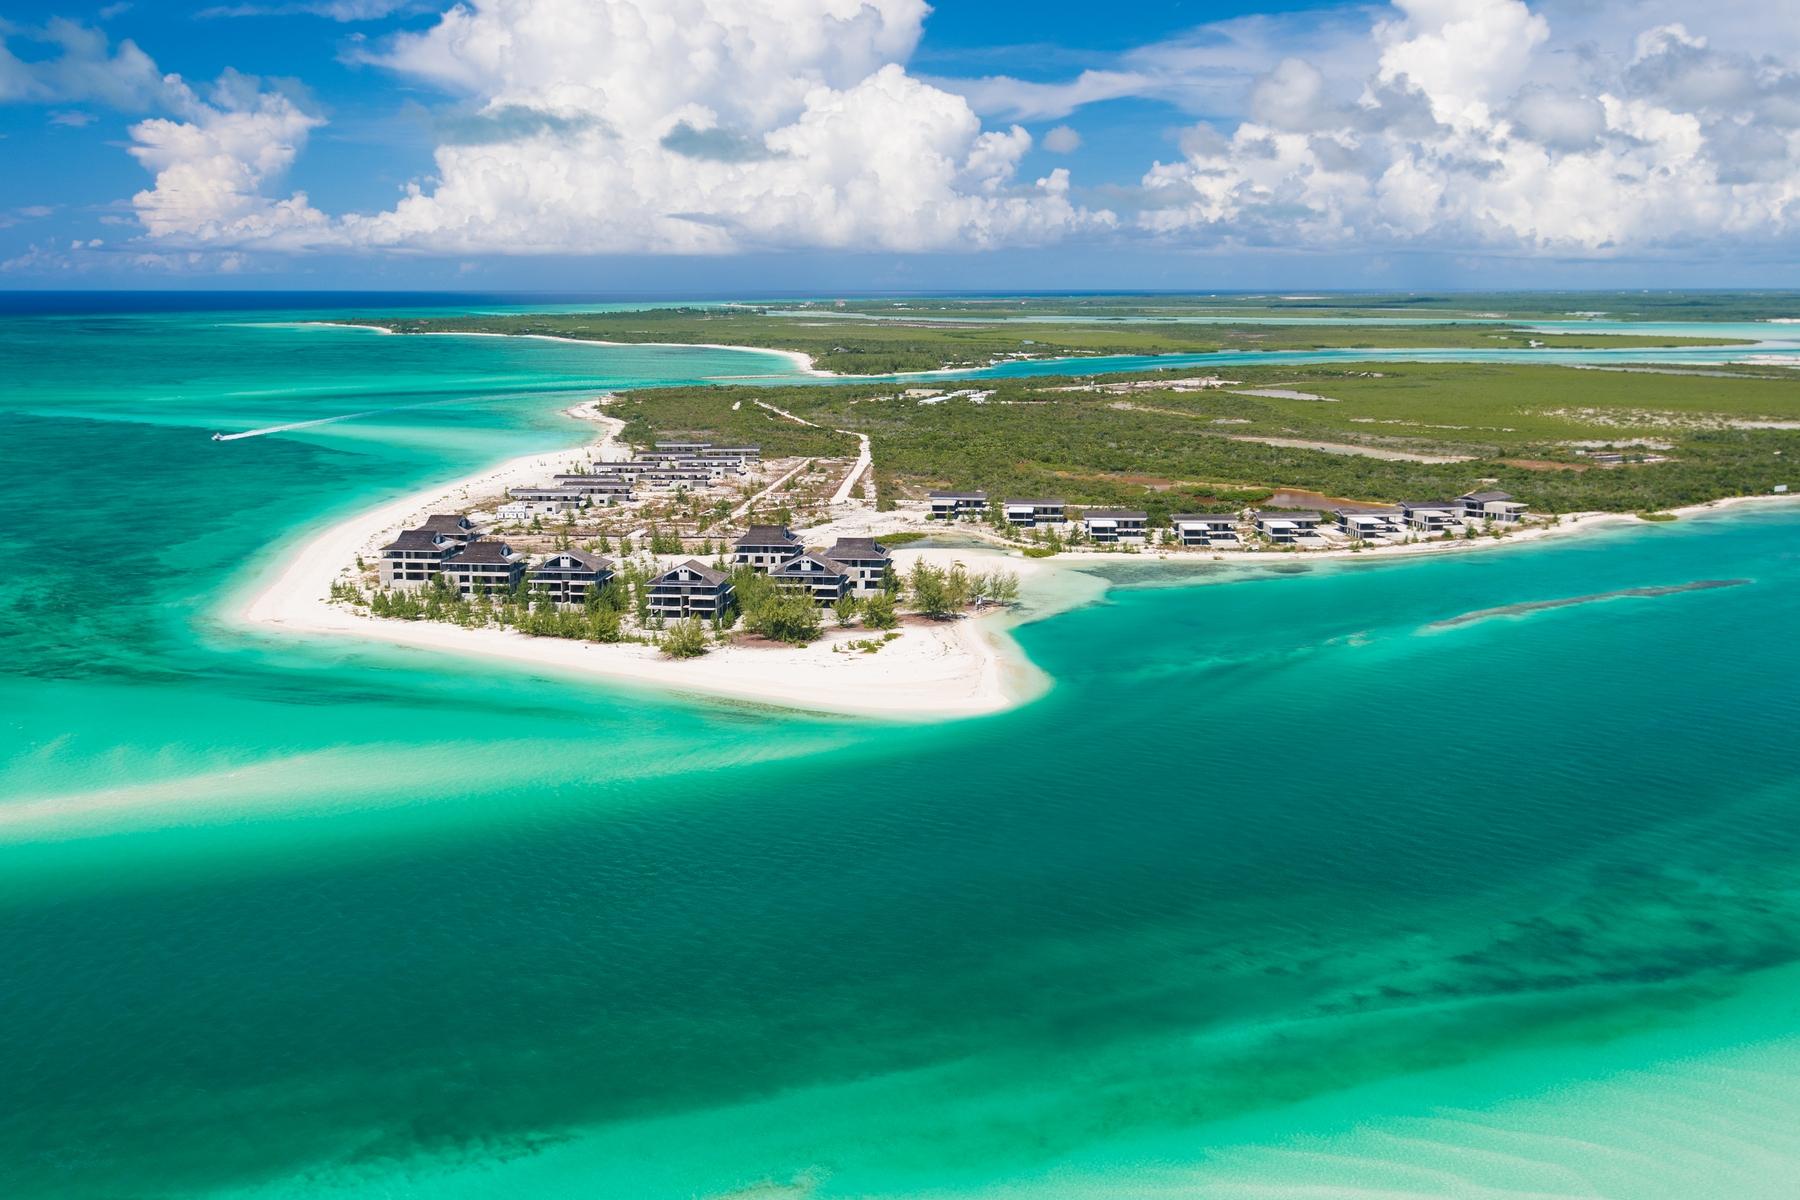 Terreno para Venda às Oceanfront Estate Lot Dellis Cay, Dellis Cay, Turks E Caicos